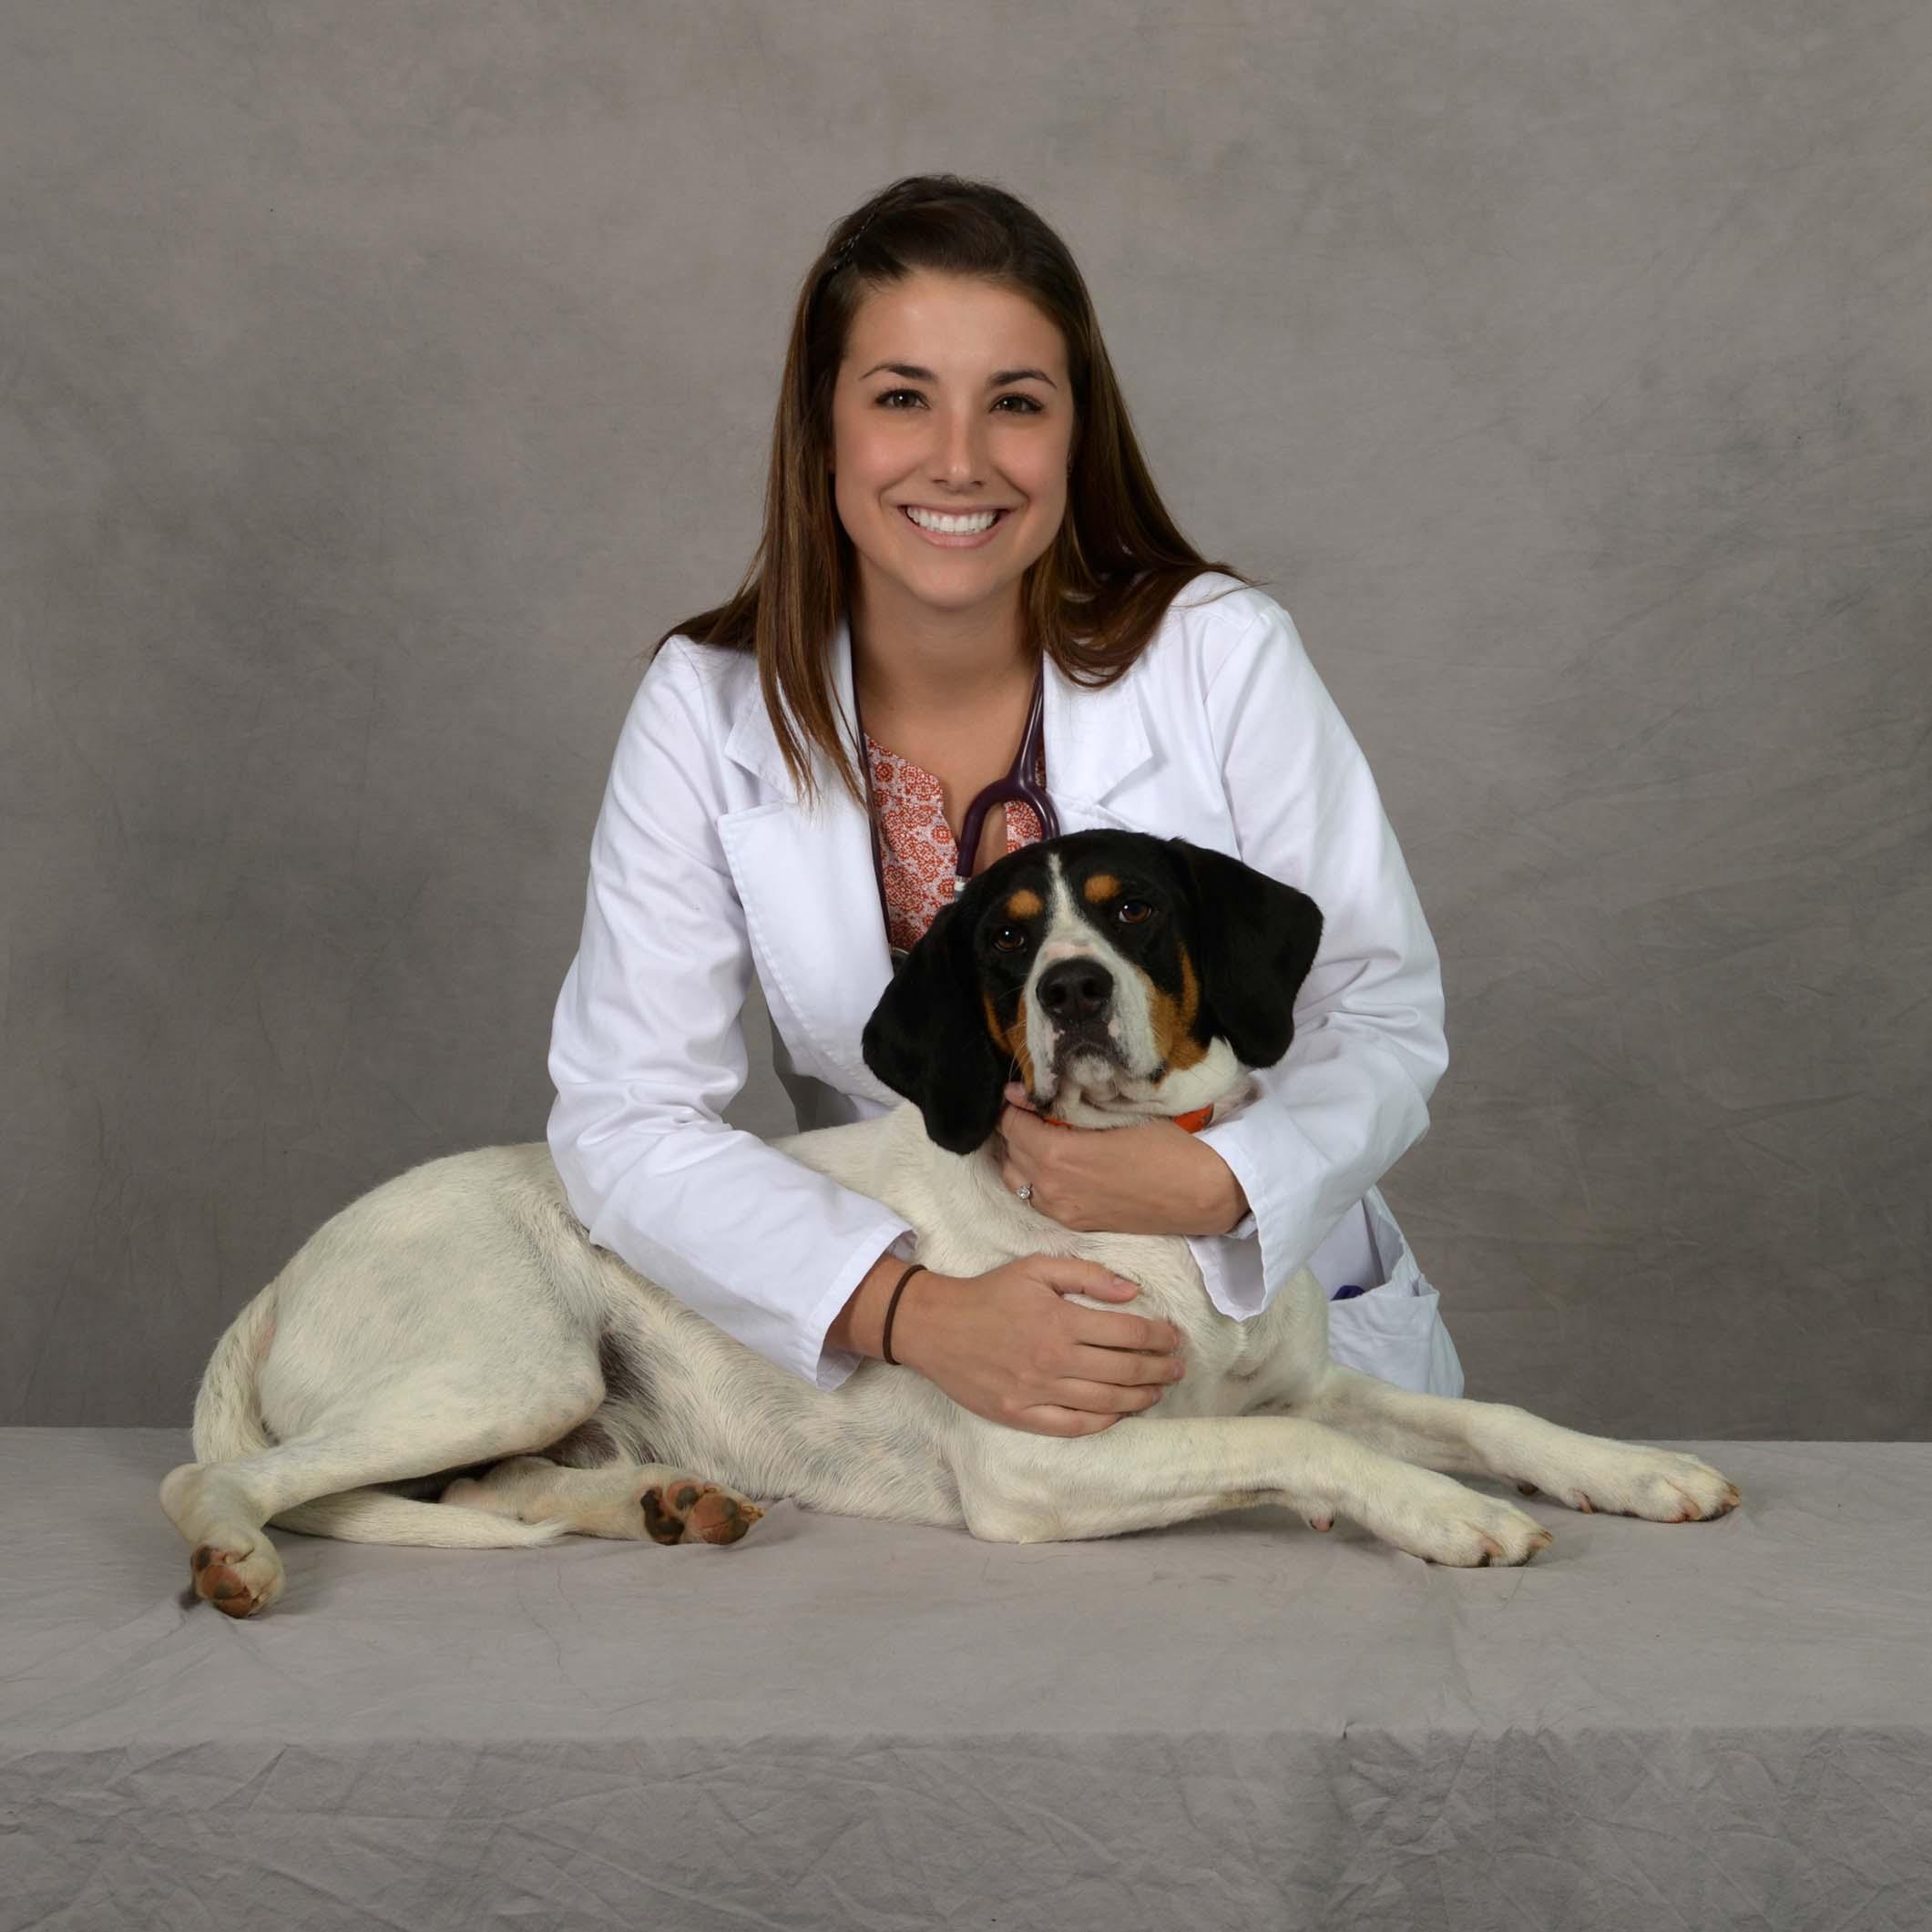 Dr. Amanda Gudgel